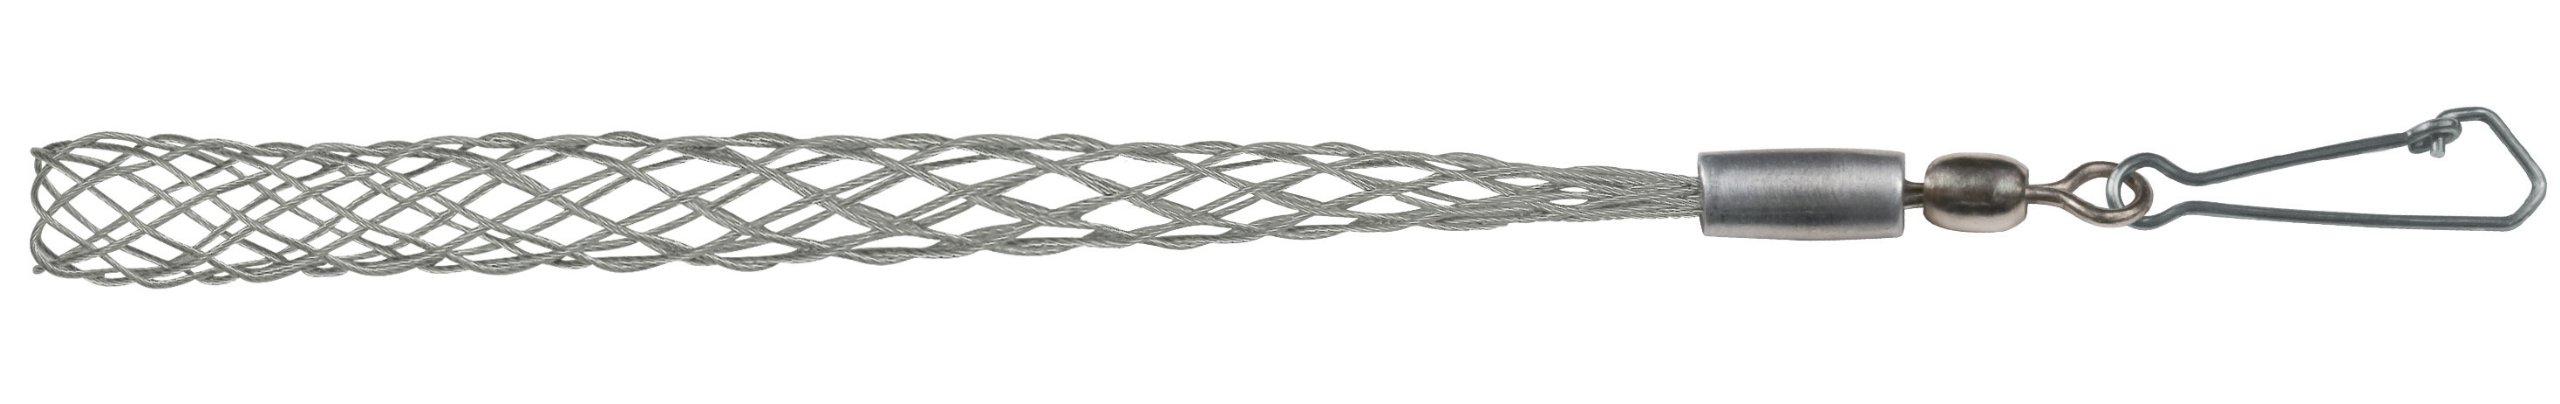 Wire Pulling Grip 1/2-Inch to 9/16-Inch Klein Tools KPS050SEN